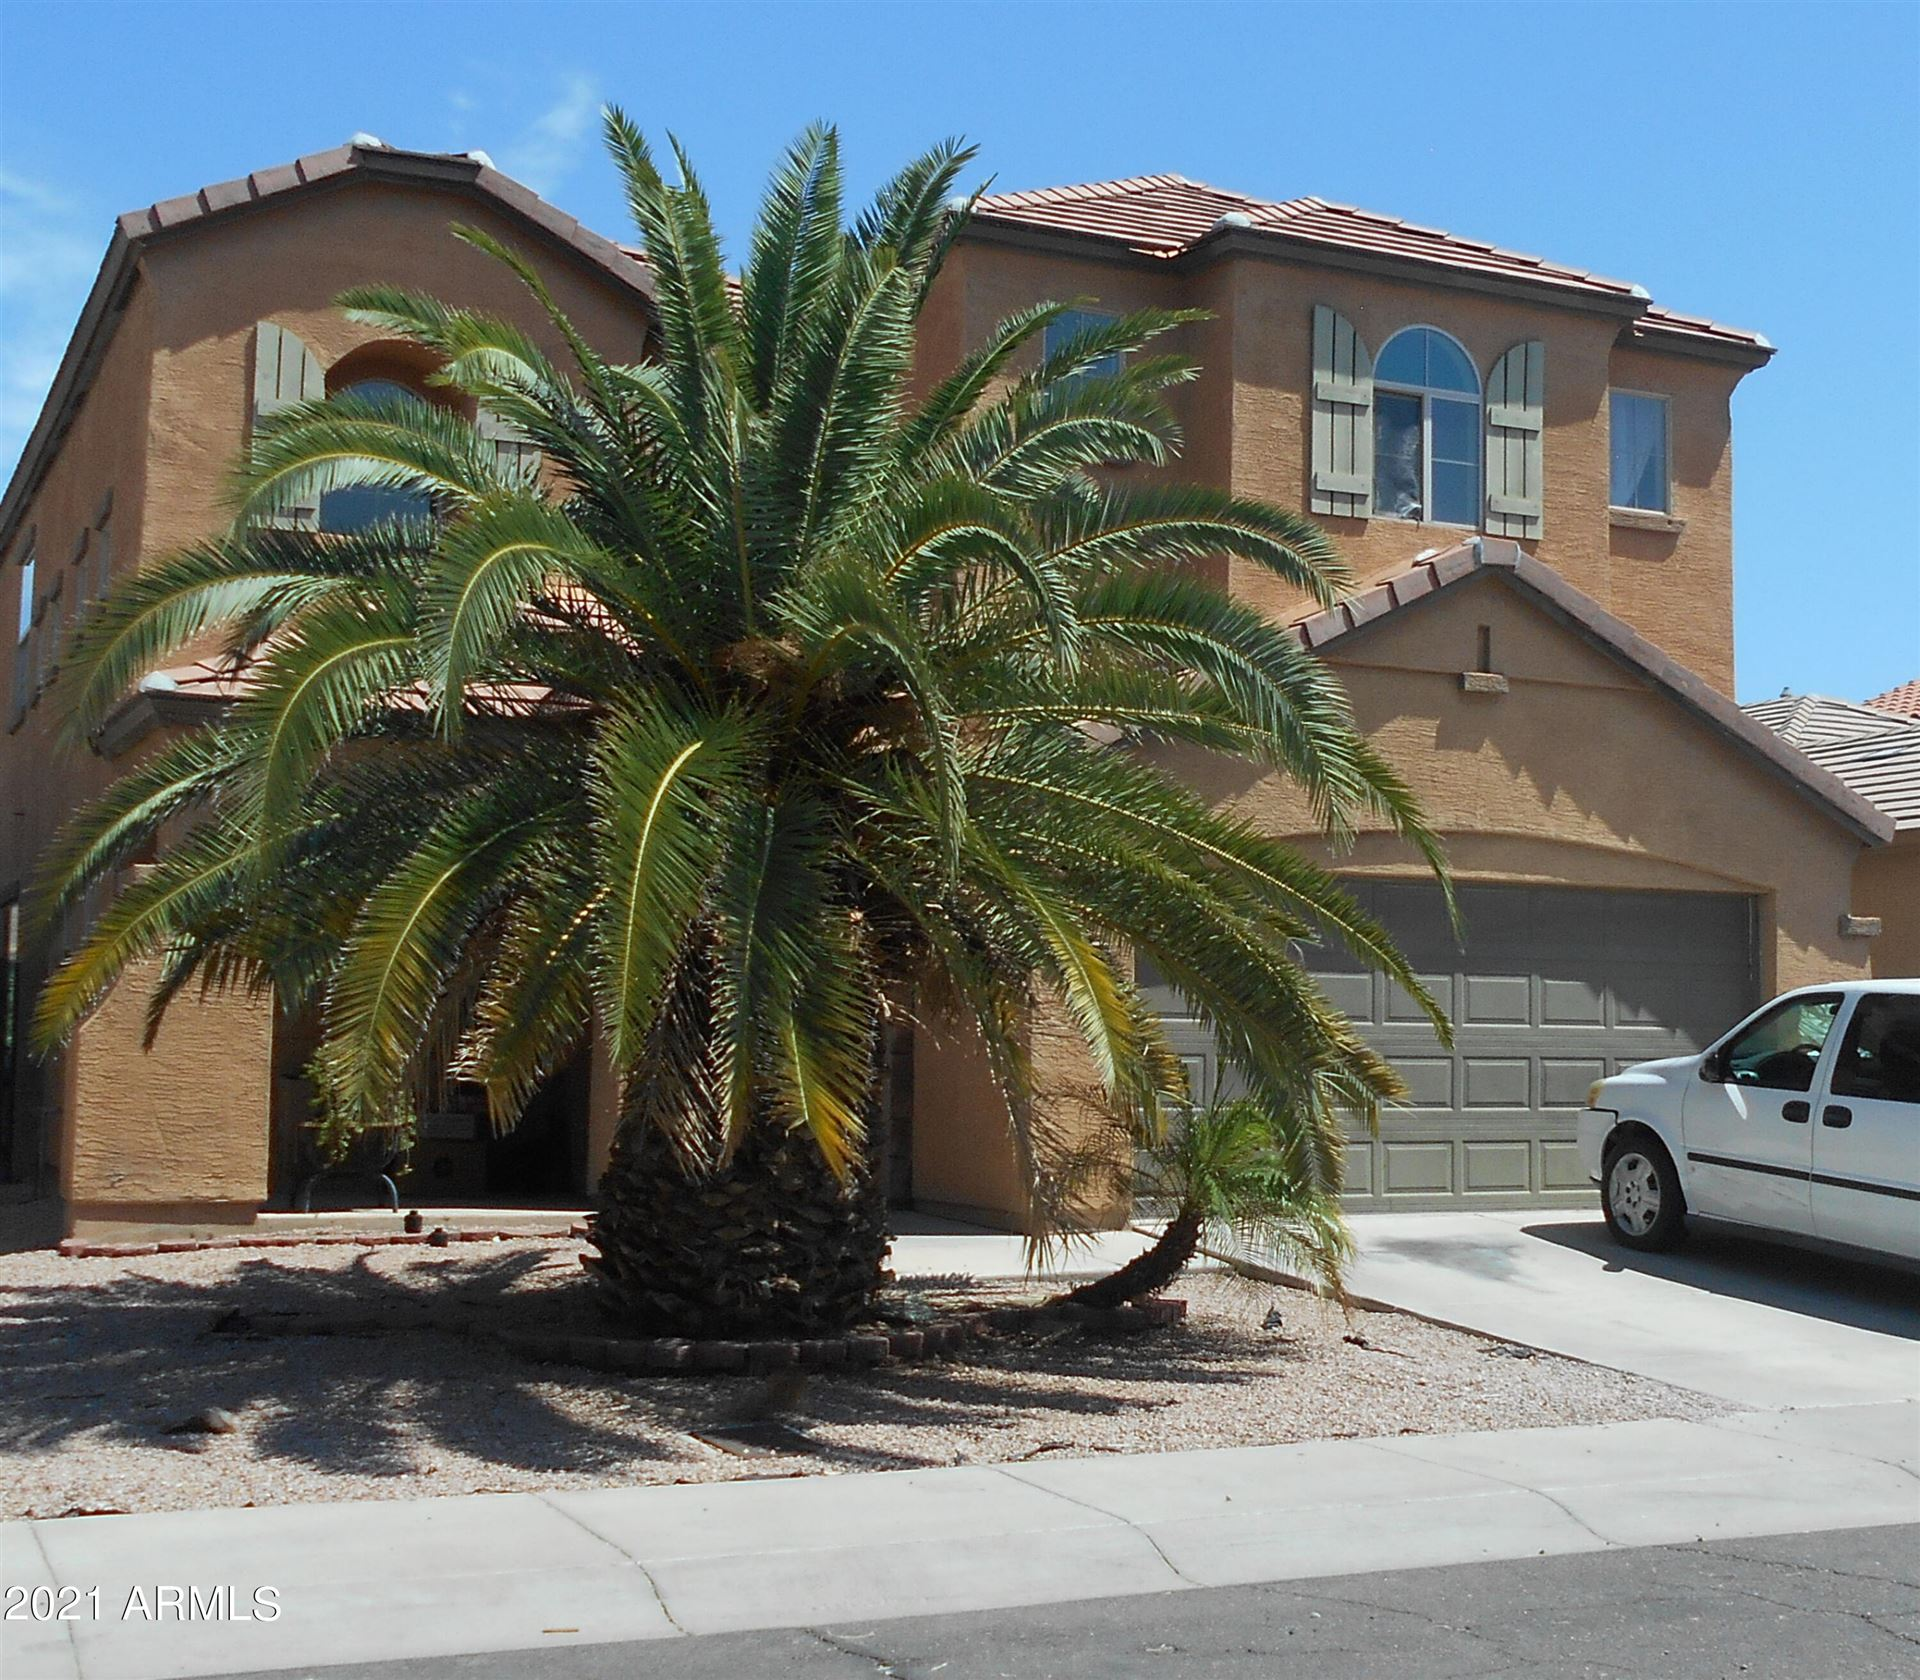 9434 W Berkeley Road, Phoenix, AZ 85037 - MLS#: 6295810